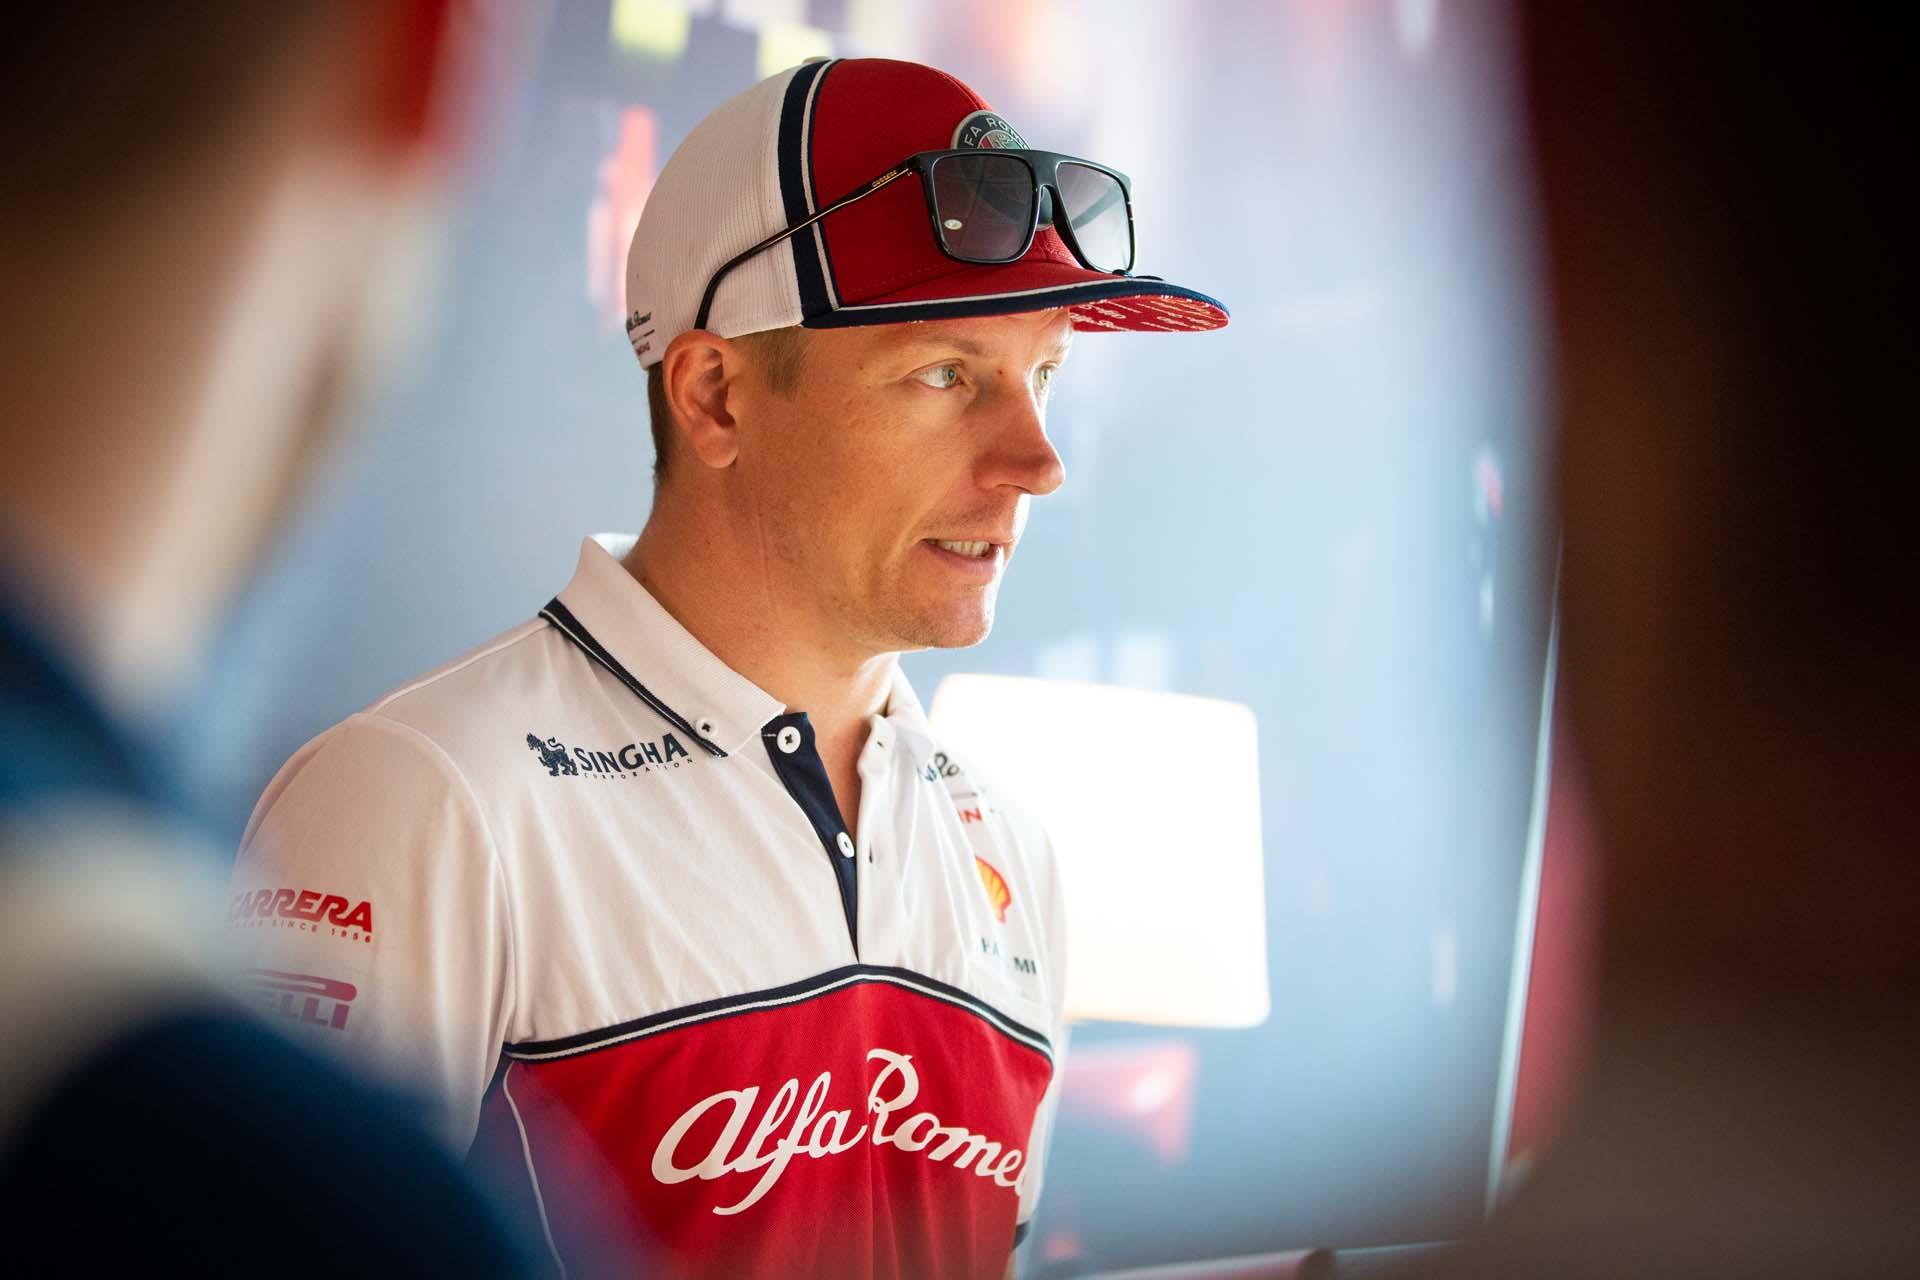 meet and greet with RAIKKONEN Kimi Räikkönen (fin), Alfa Romeo Racing C38, portrait during 2019 Formula 1 FIA world championship, Italy Grand Prix, at Monza from september 5 to 9  - Photo Antonin Vincent / DPPI